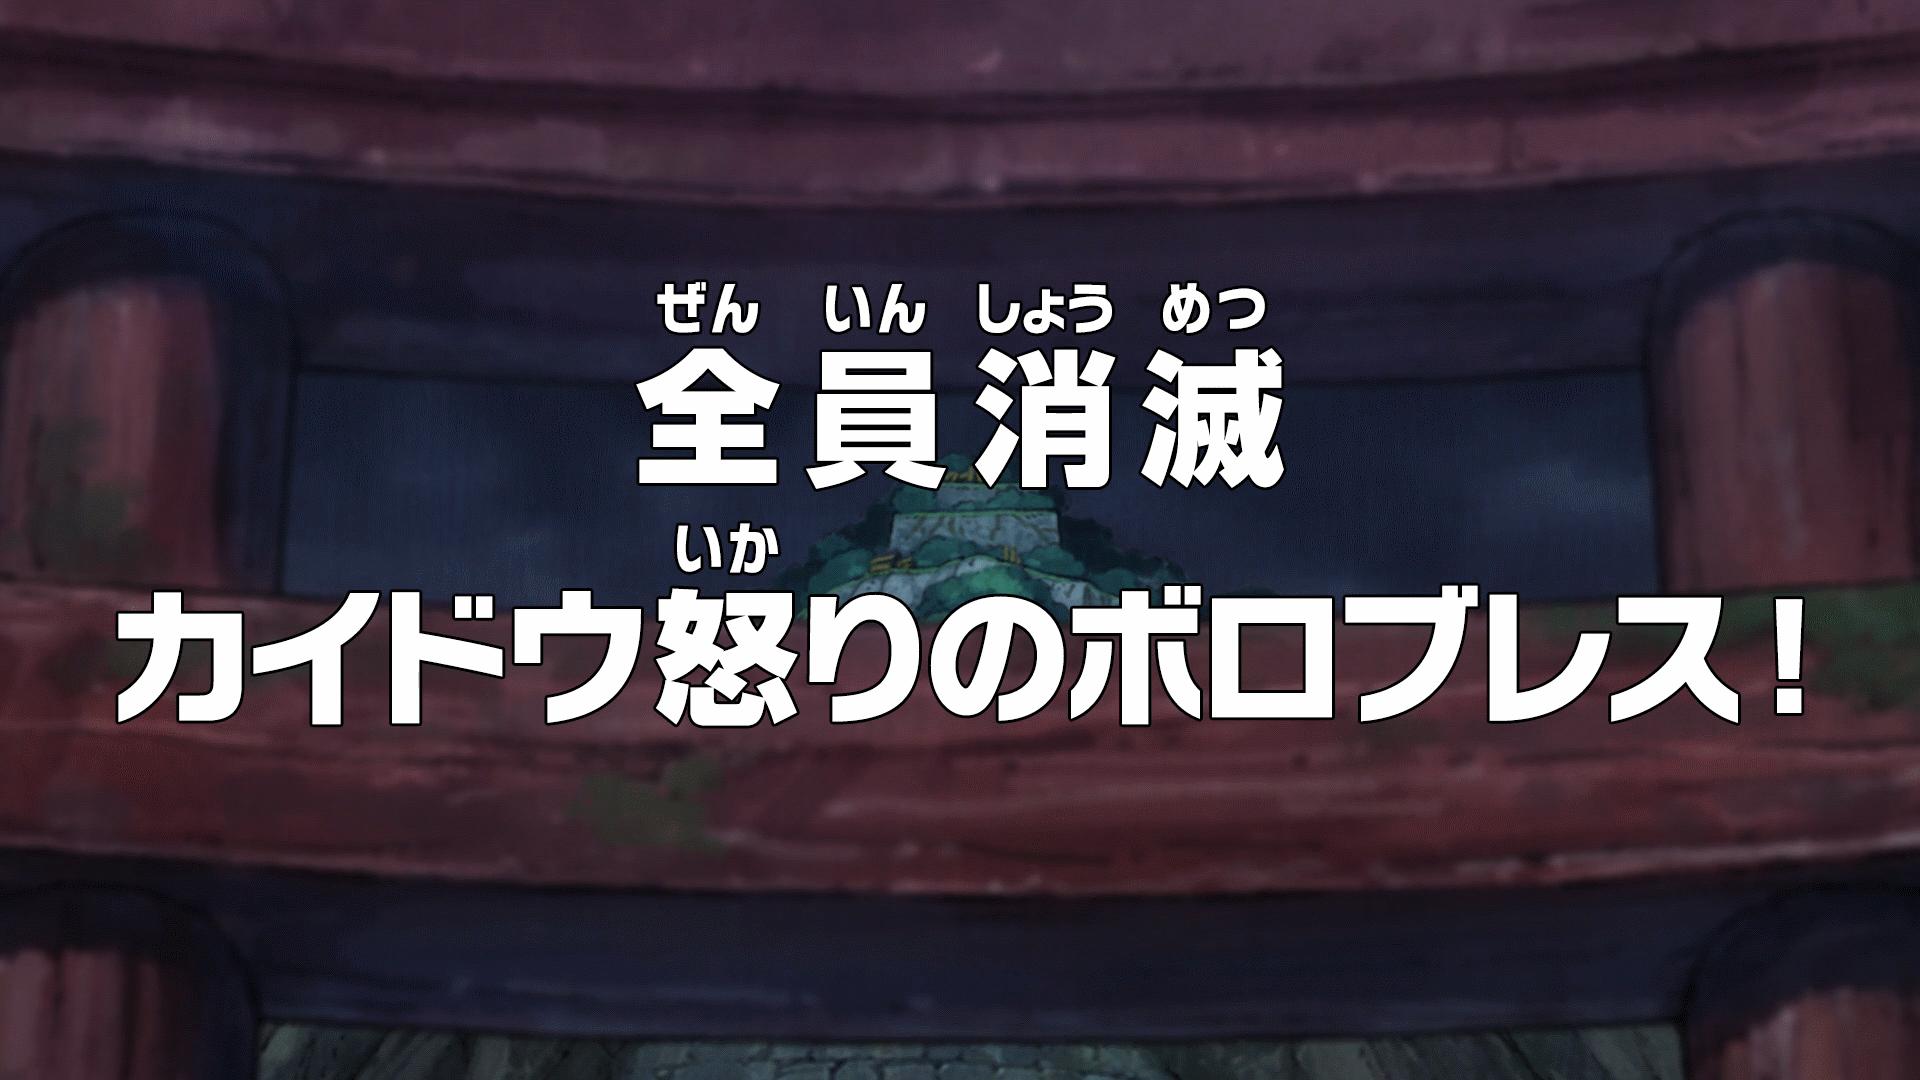 Episodio 913